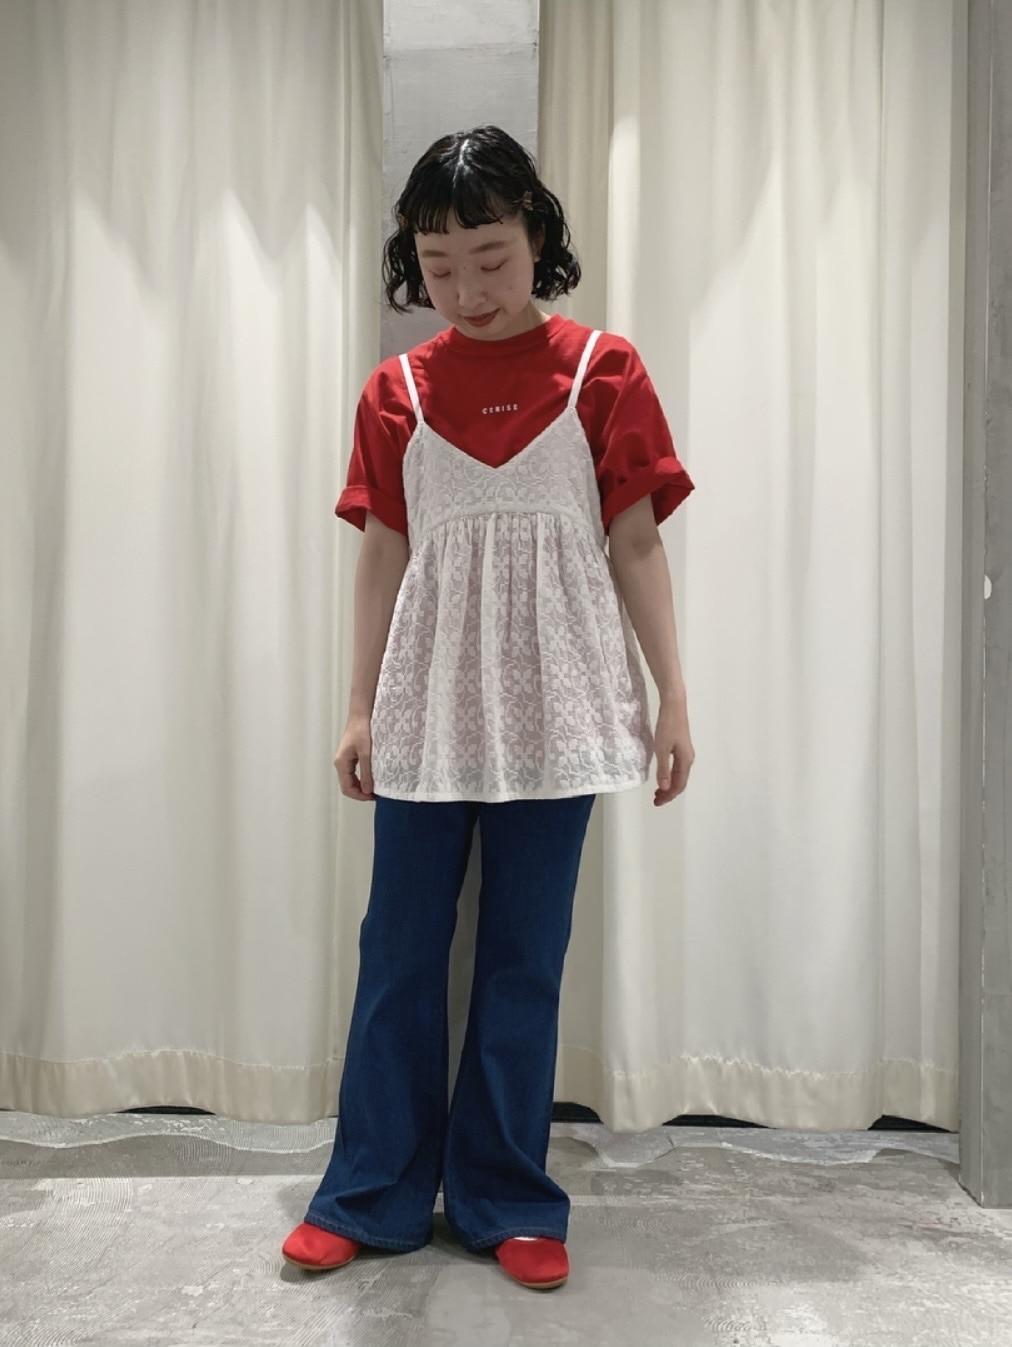 - CHILD WOMAN CHILD WOMAN , PAR ICI ルミネ横浜 身長:157cm 2021.06.09